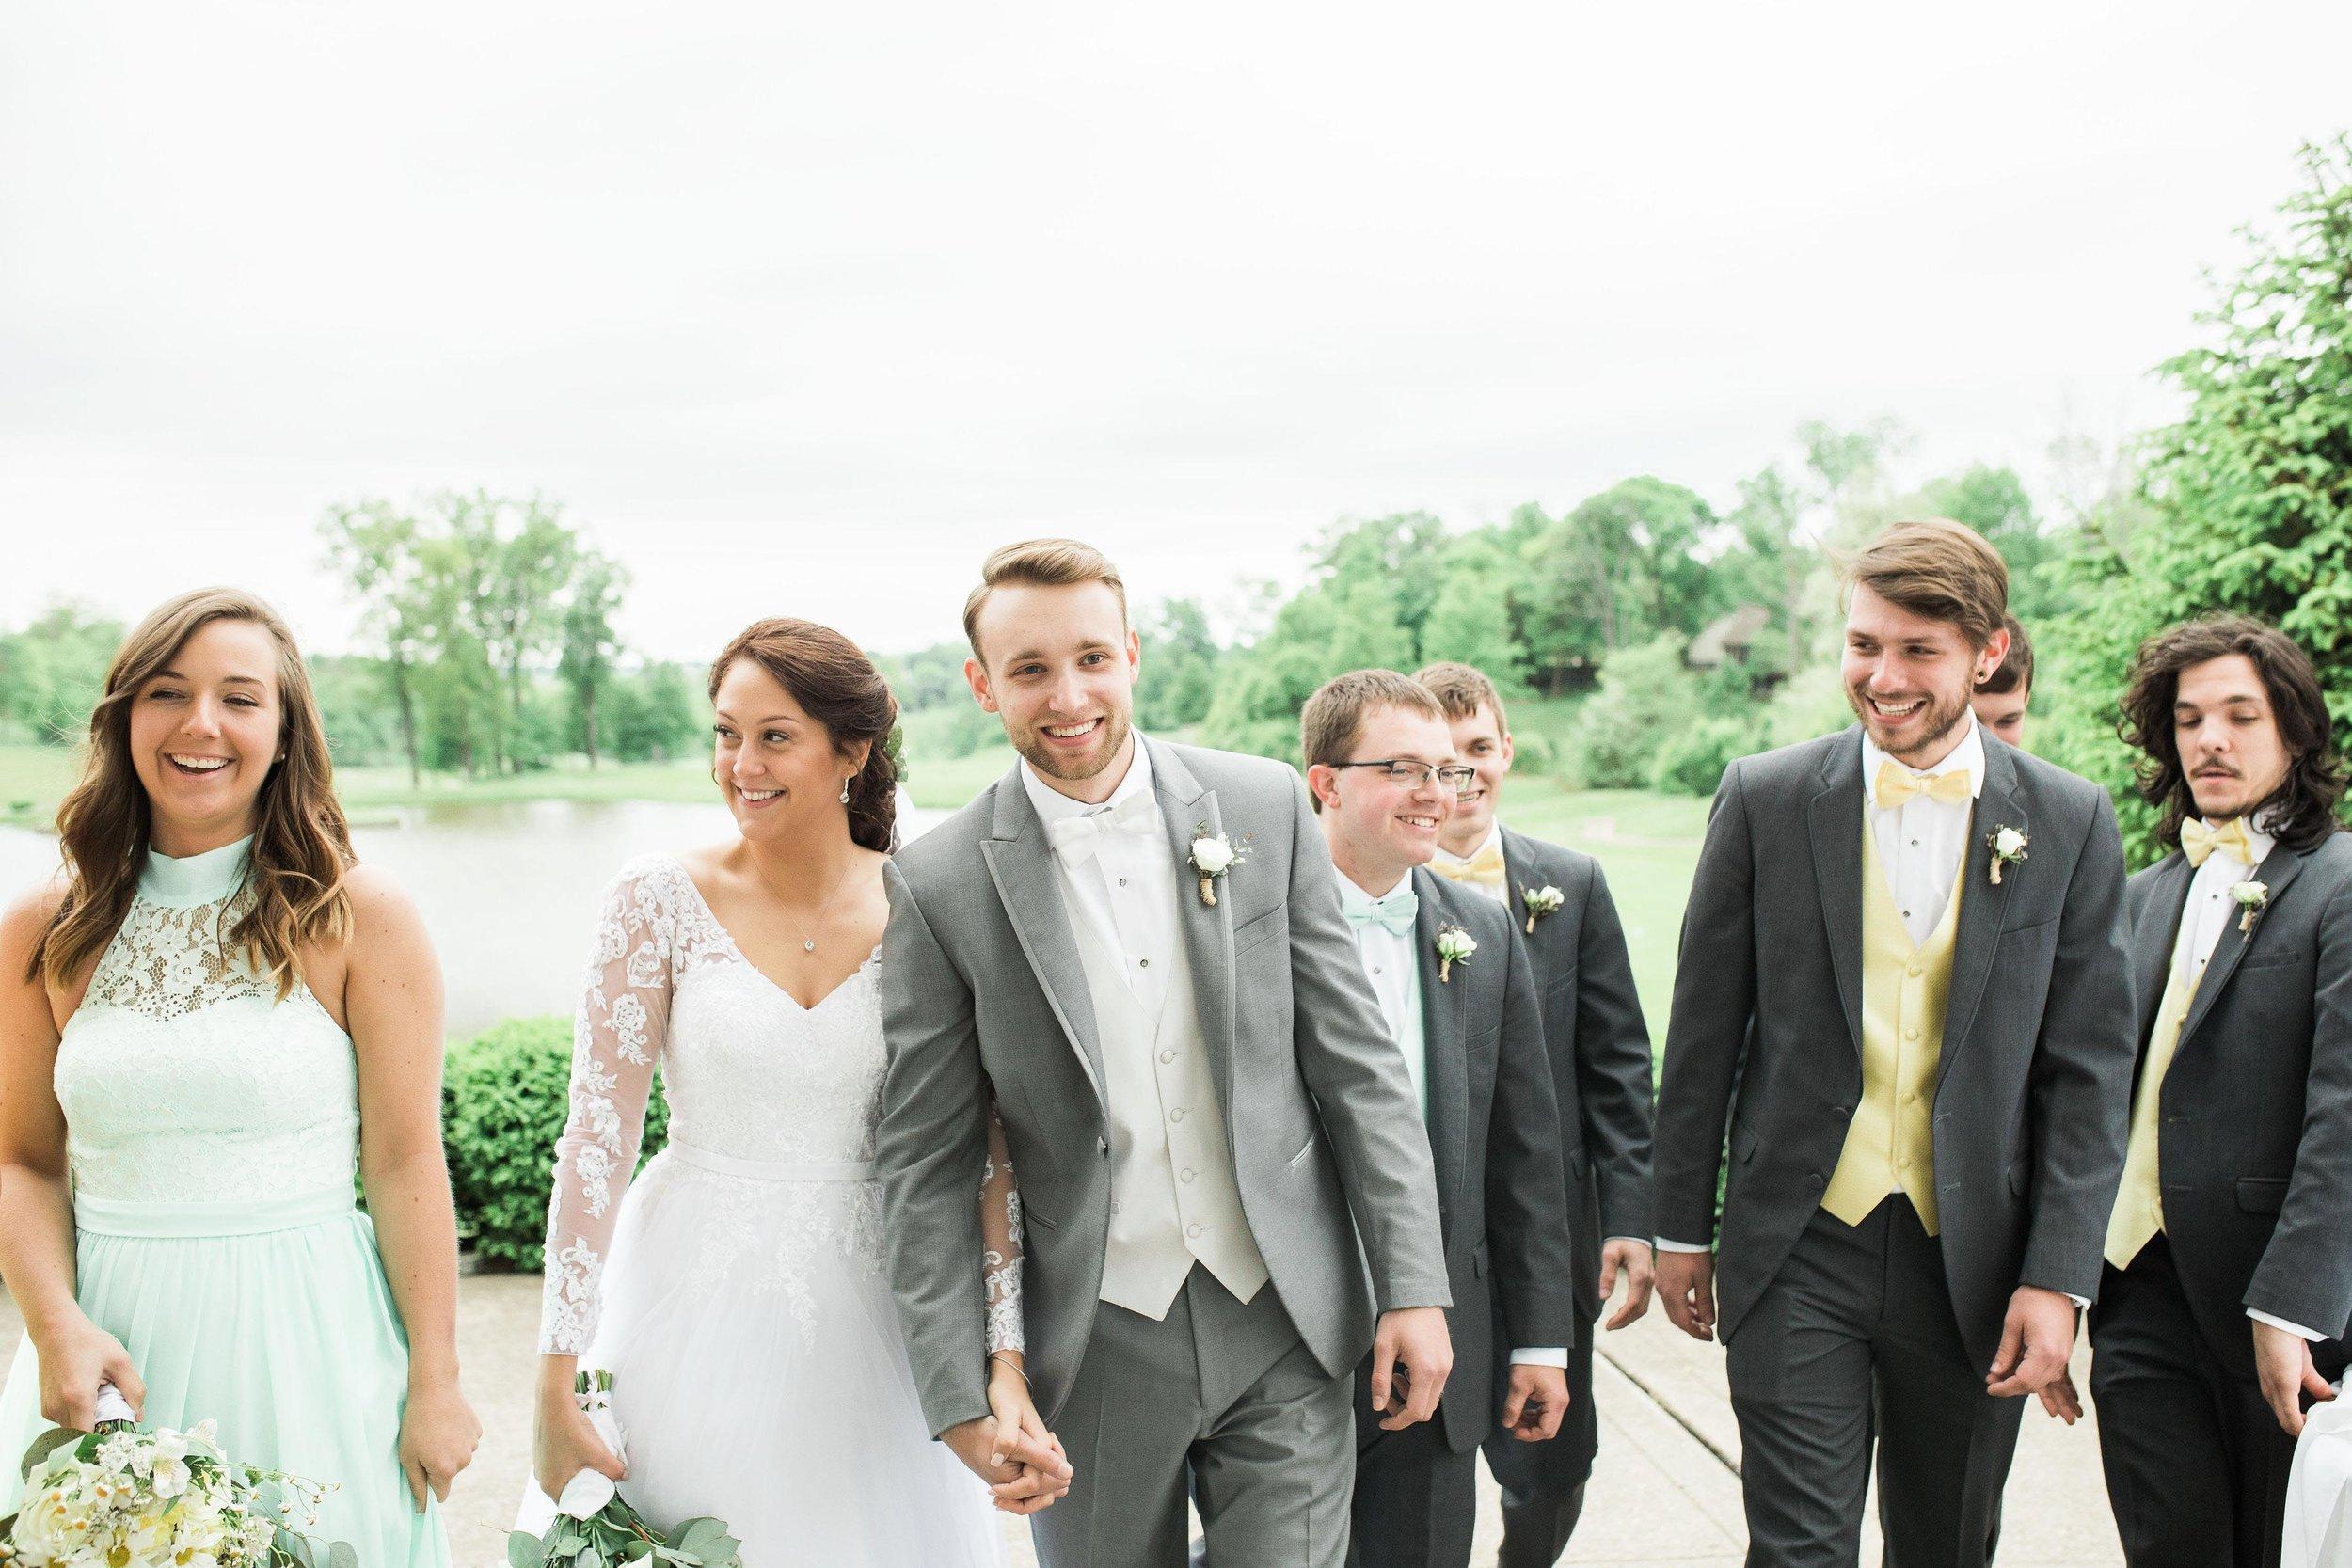 pebble creek golf course wedding-3.jpg